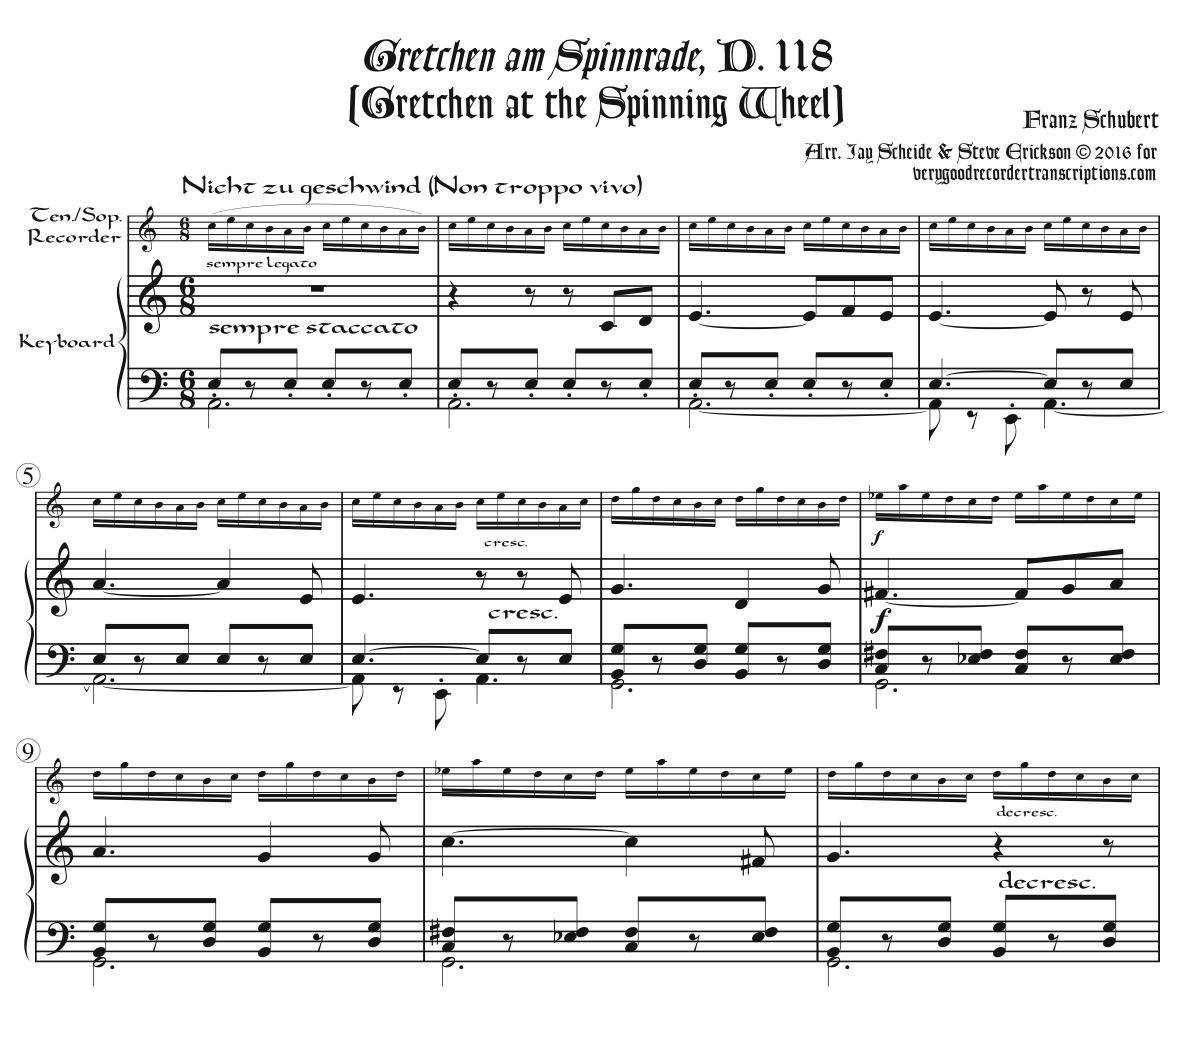 *Gretchen am Spinnrade*, D. 118, for tenor or soprano recorder & keyboard